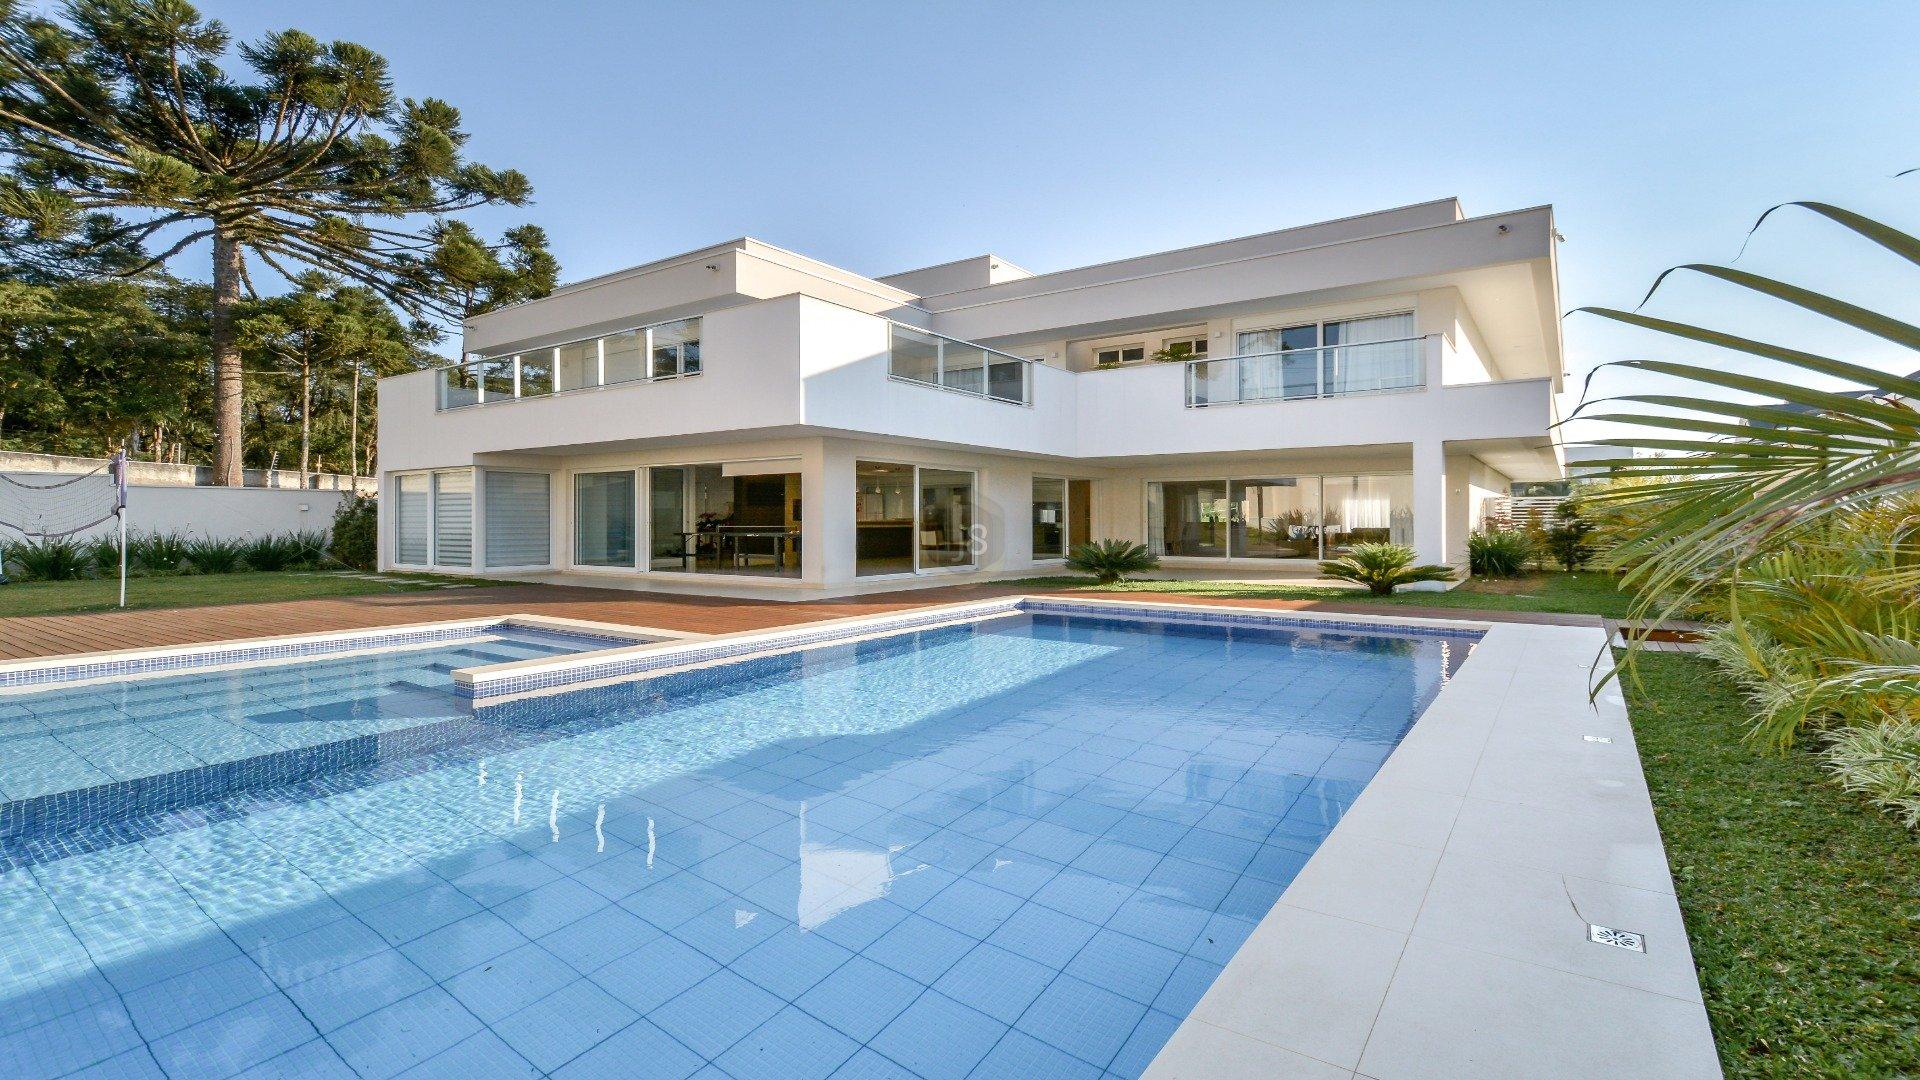 Foto de destaque Linda casa moderna 4 suites e piscina